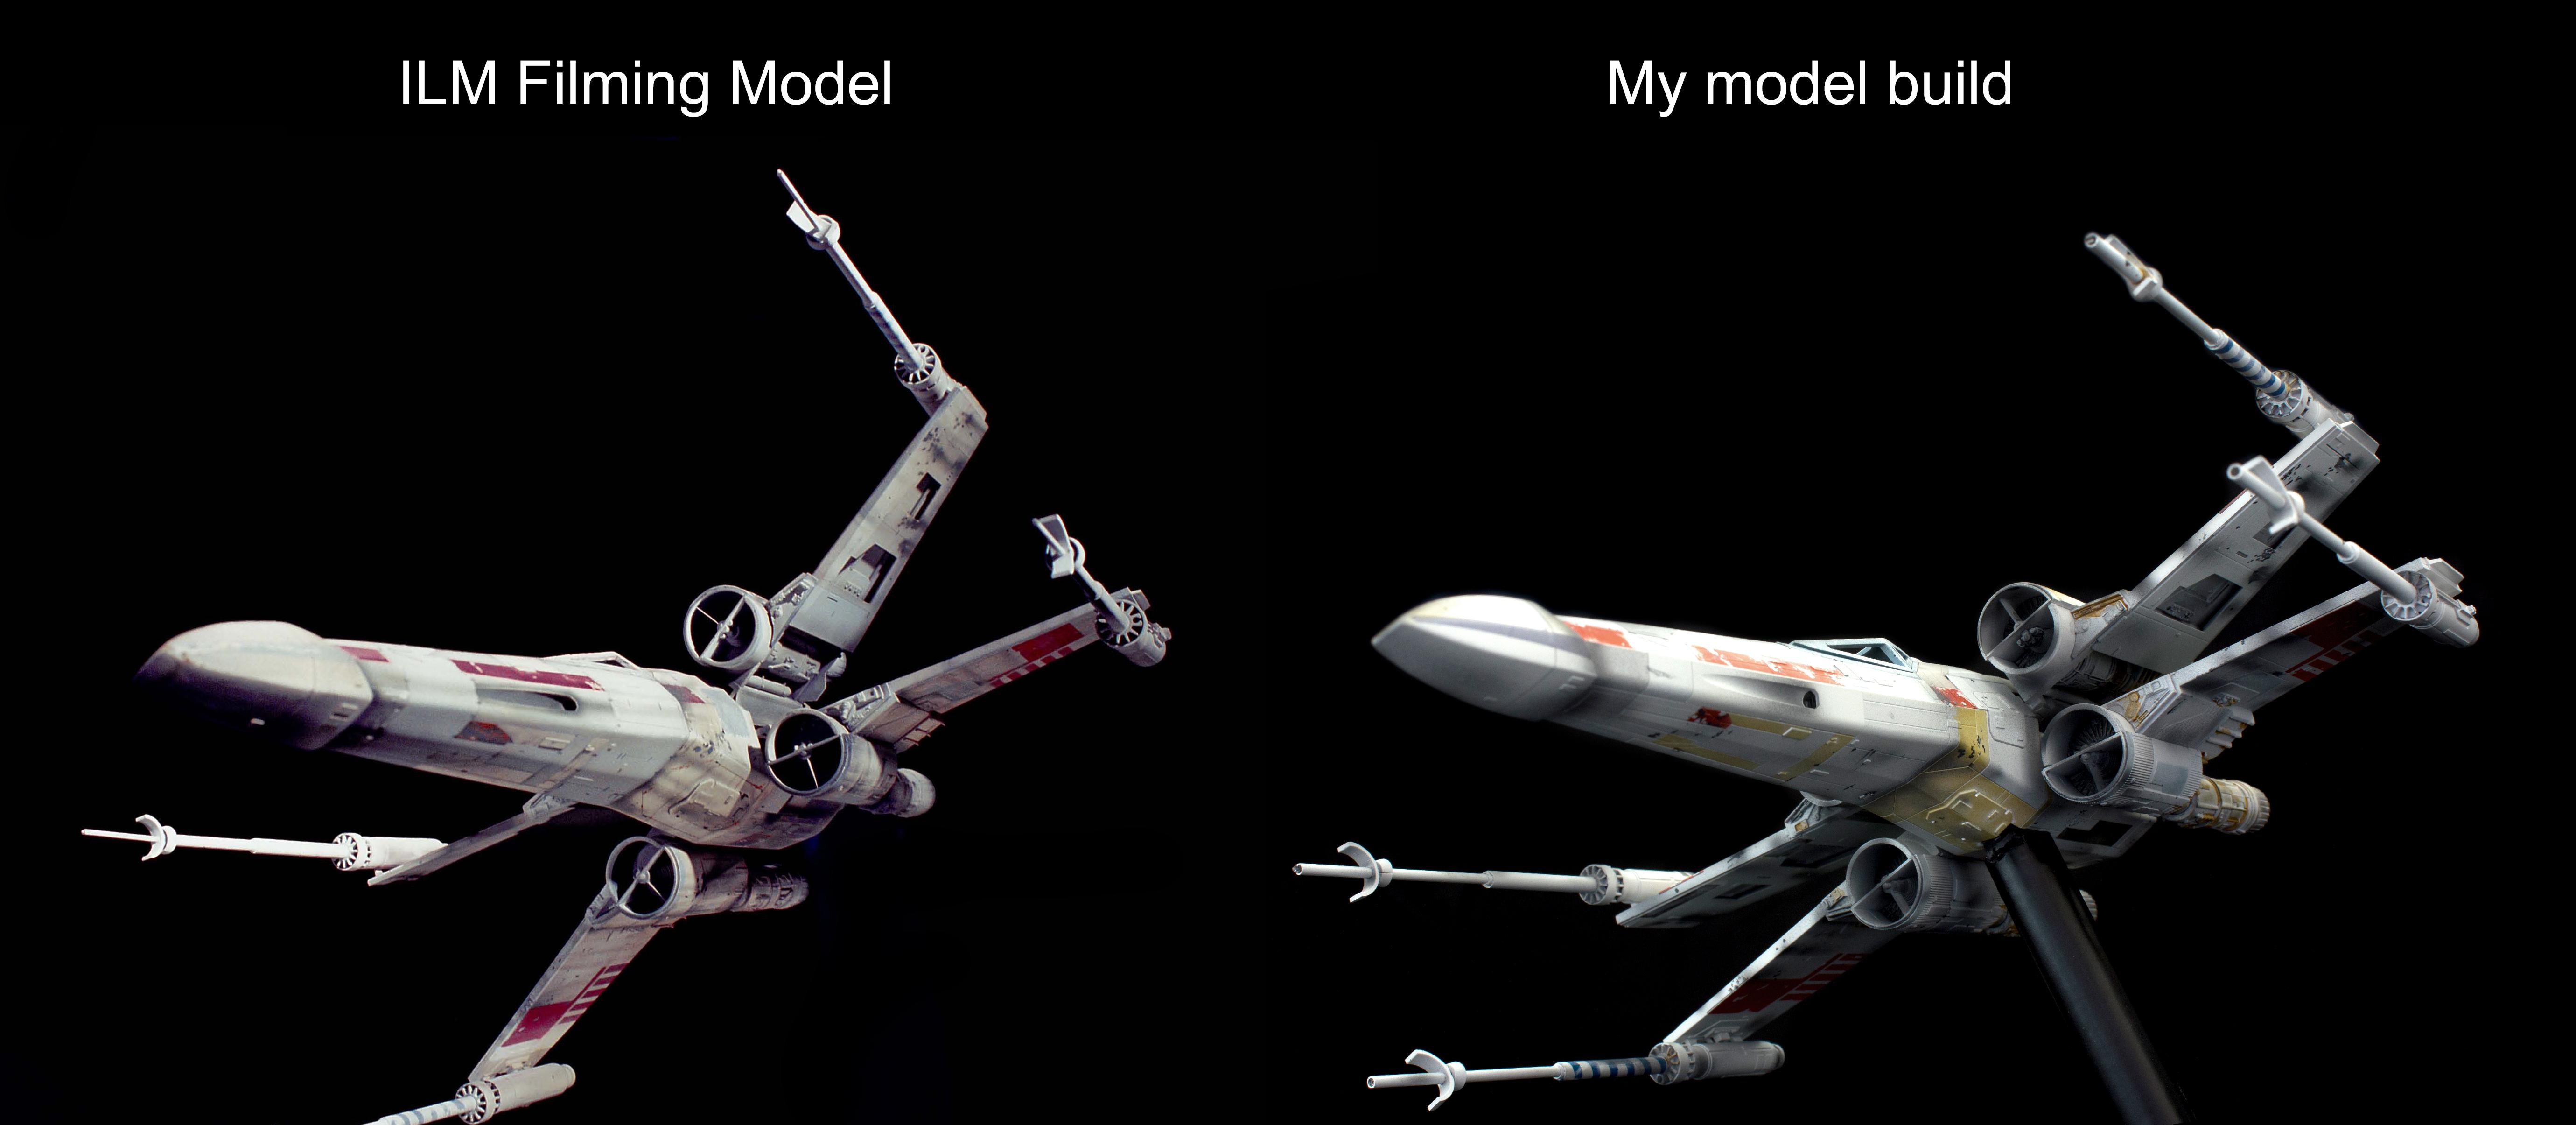 SW_X-Wing43_Comparison 3.jpg